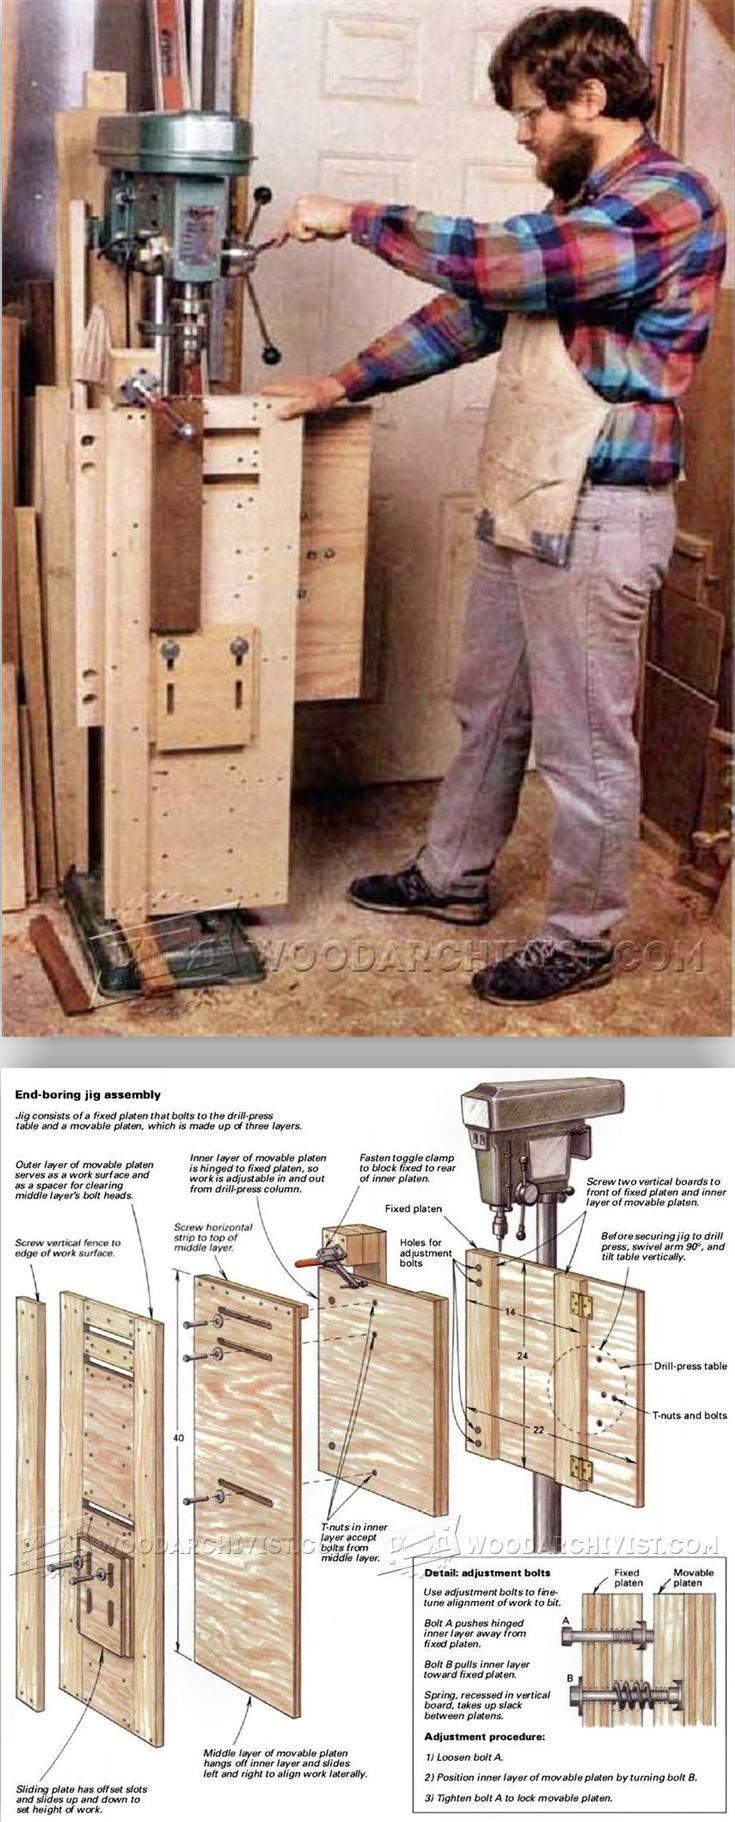 Vertical Drilling Jig - Drill Press Tips, Jigs and Fixtures   WoodArchivist.com